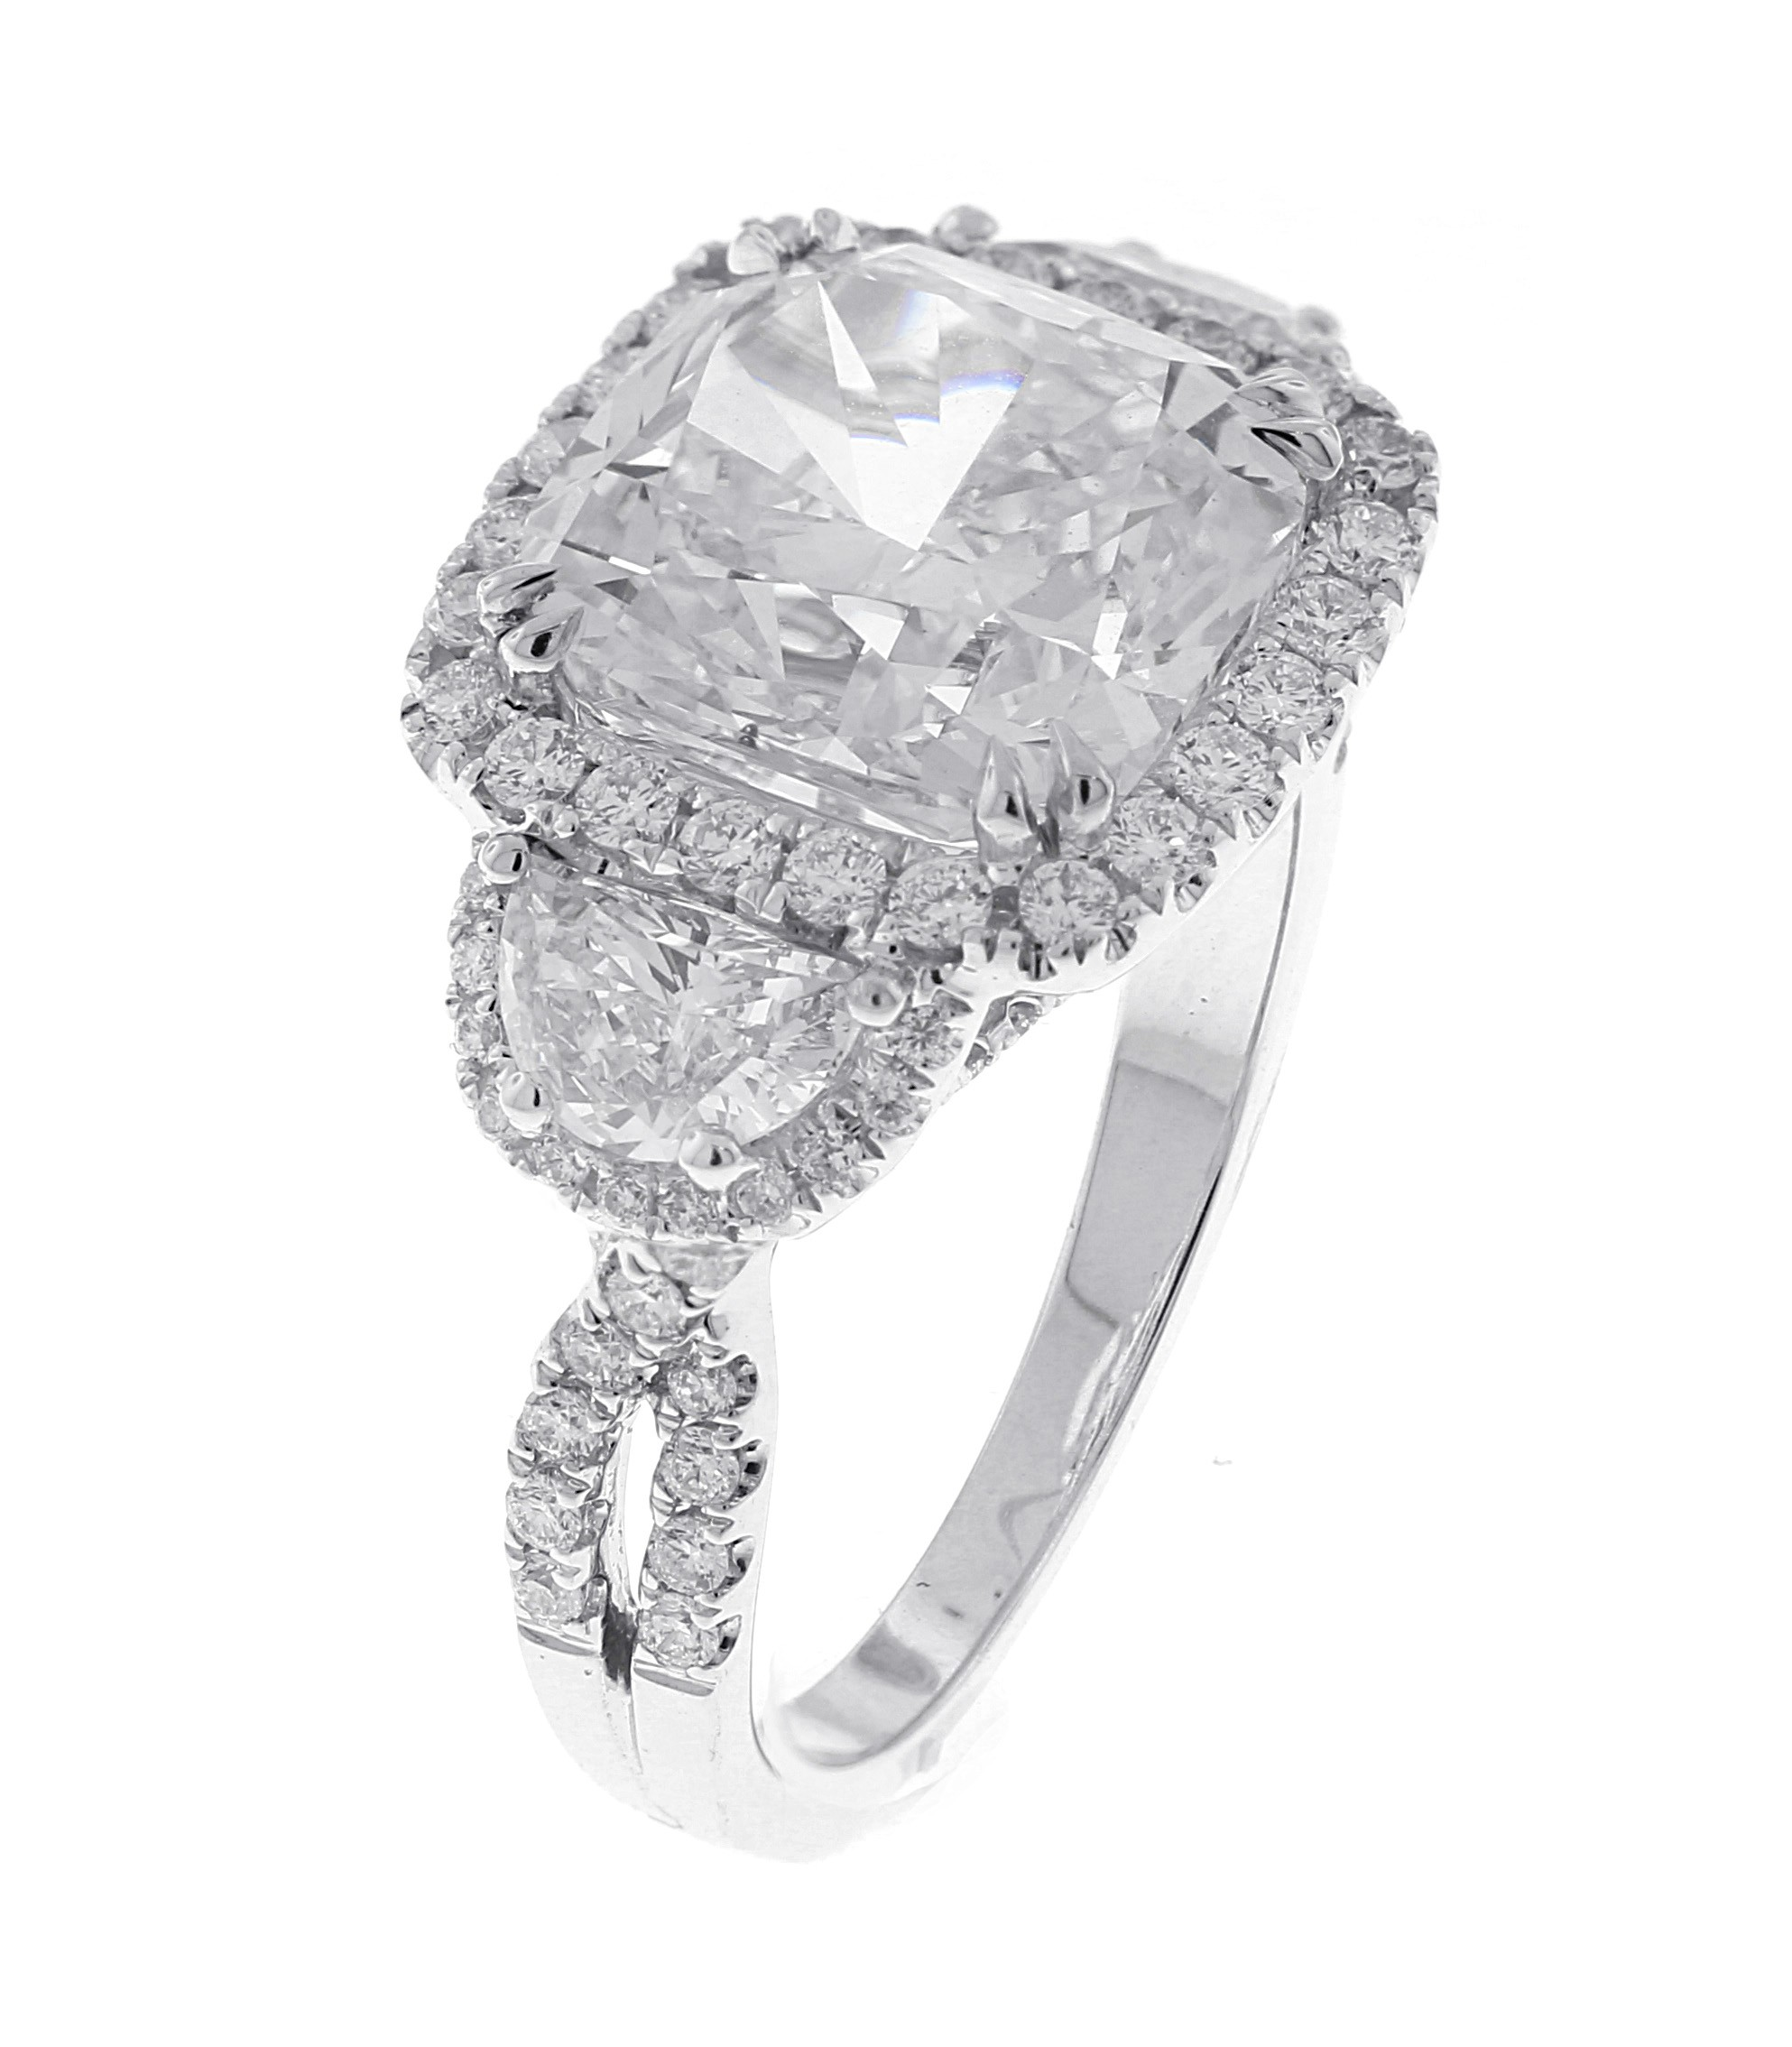 18kt White Gold GIA Certified Cushion Diamond Ring